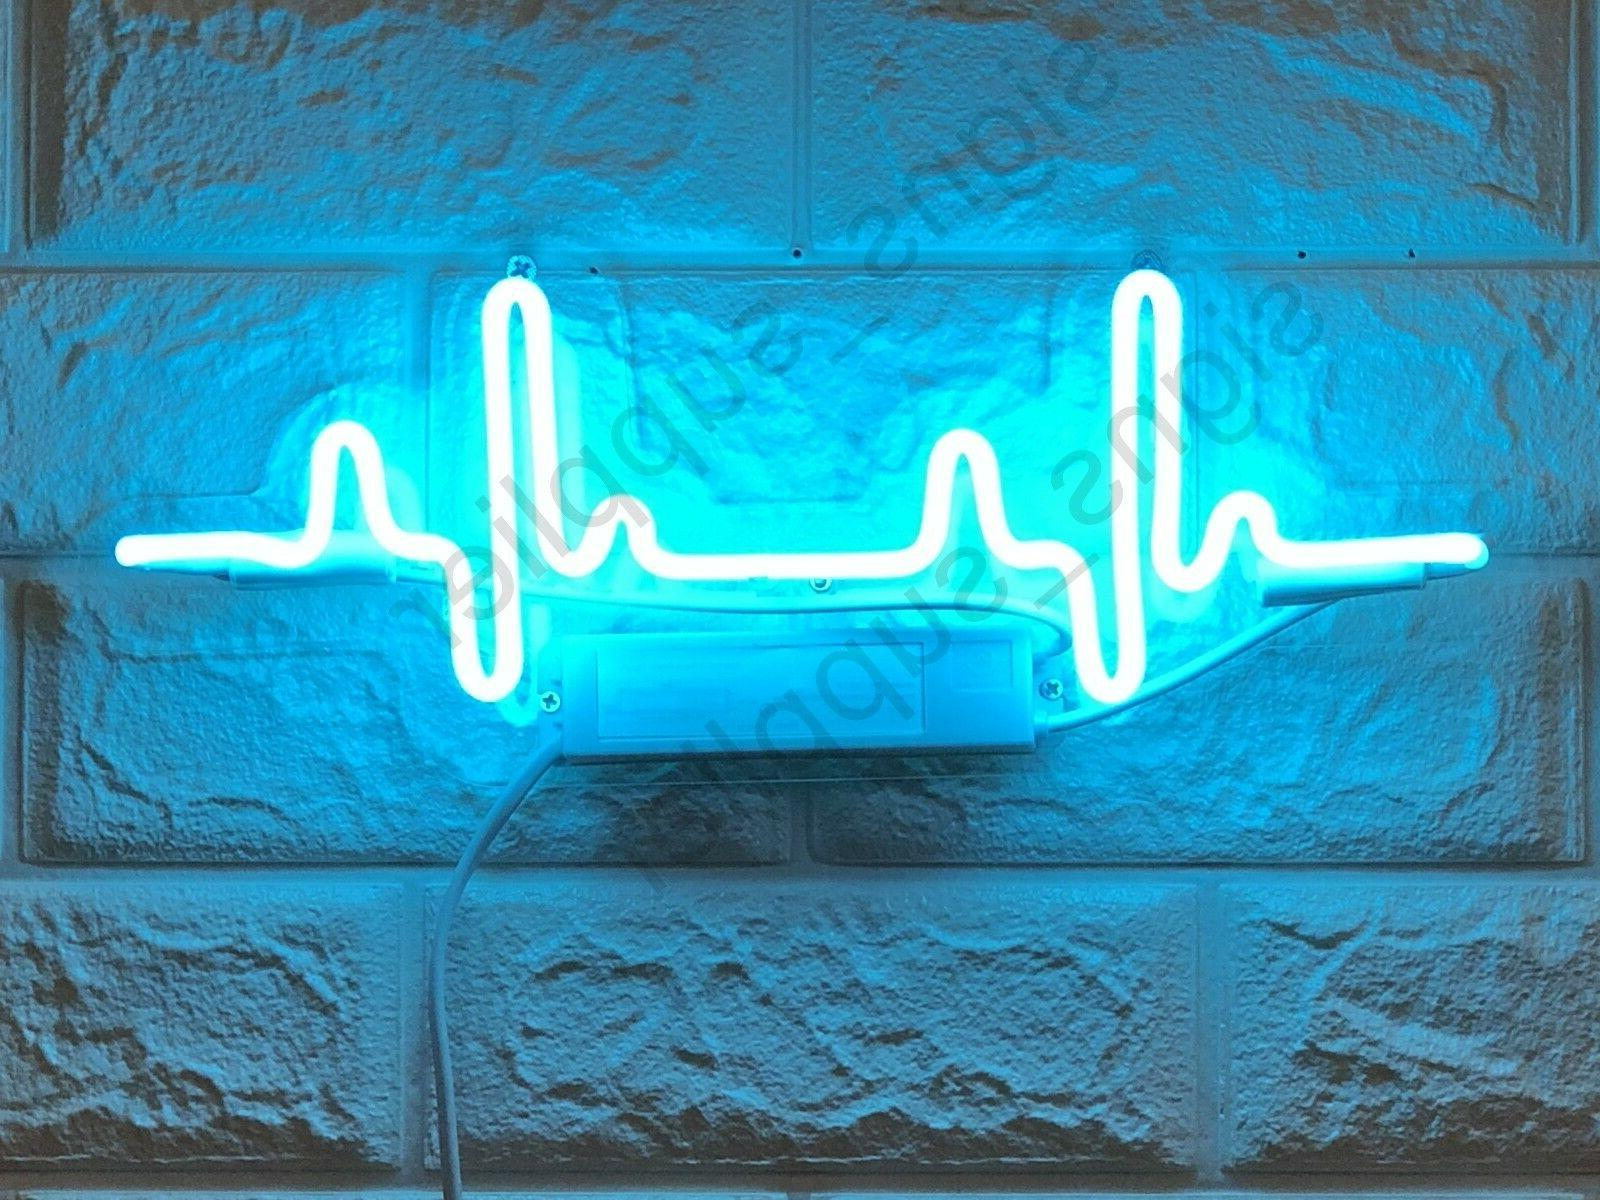 New Beating Heart Rate Acrylic Lamp Wall Decor Artwork  Neon